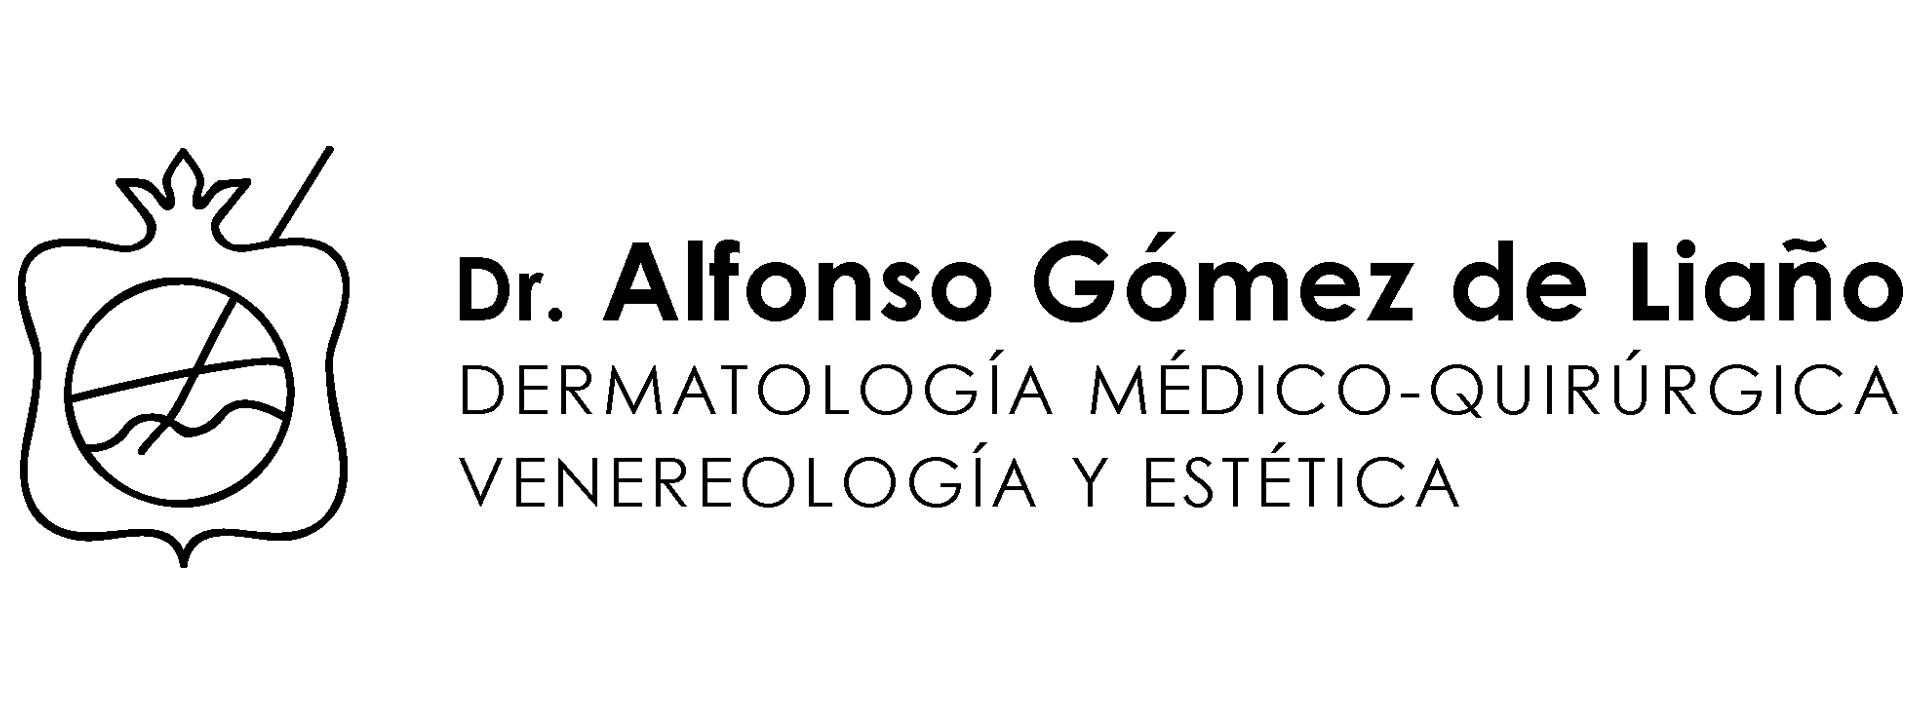 Alfonso Gómez de Liaño